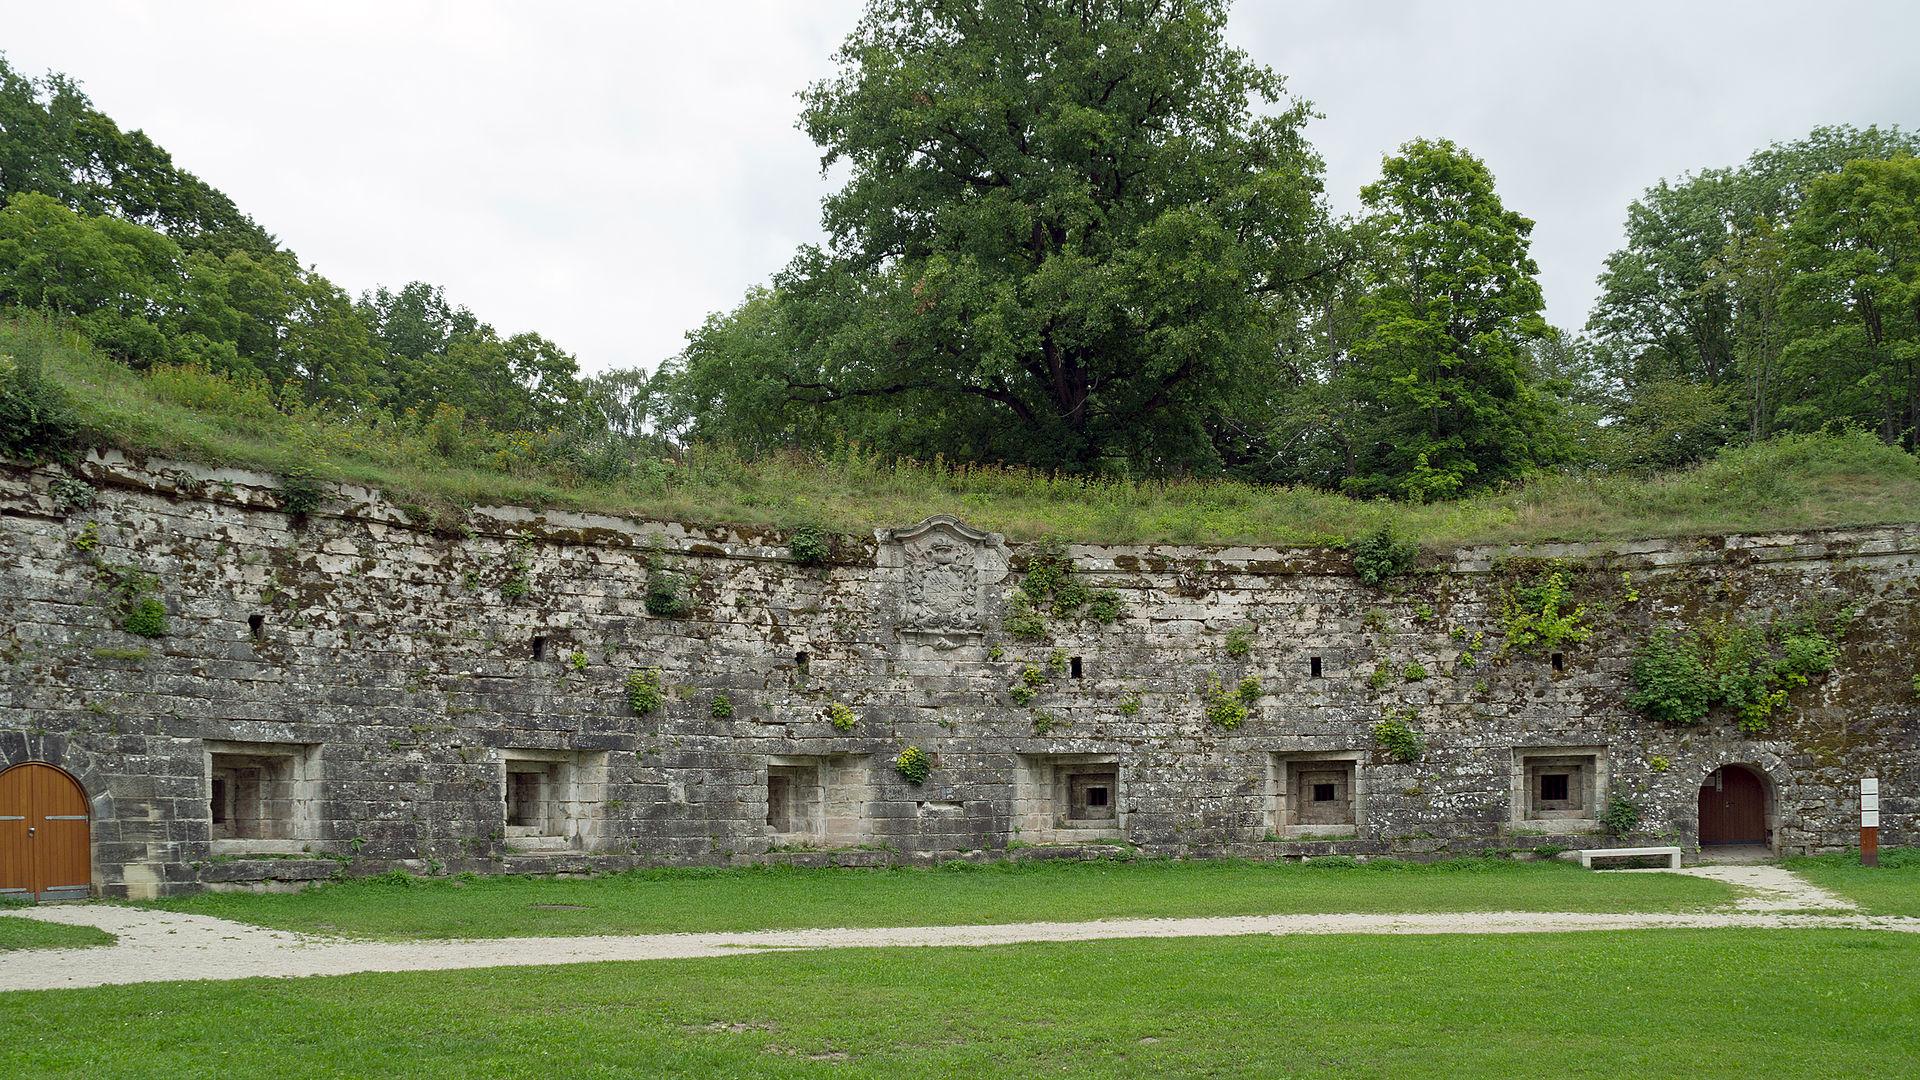 1920px-Festung_Rosenberg_-_Contregarde_Carl.jpg